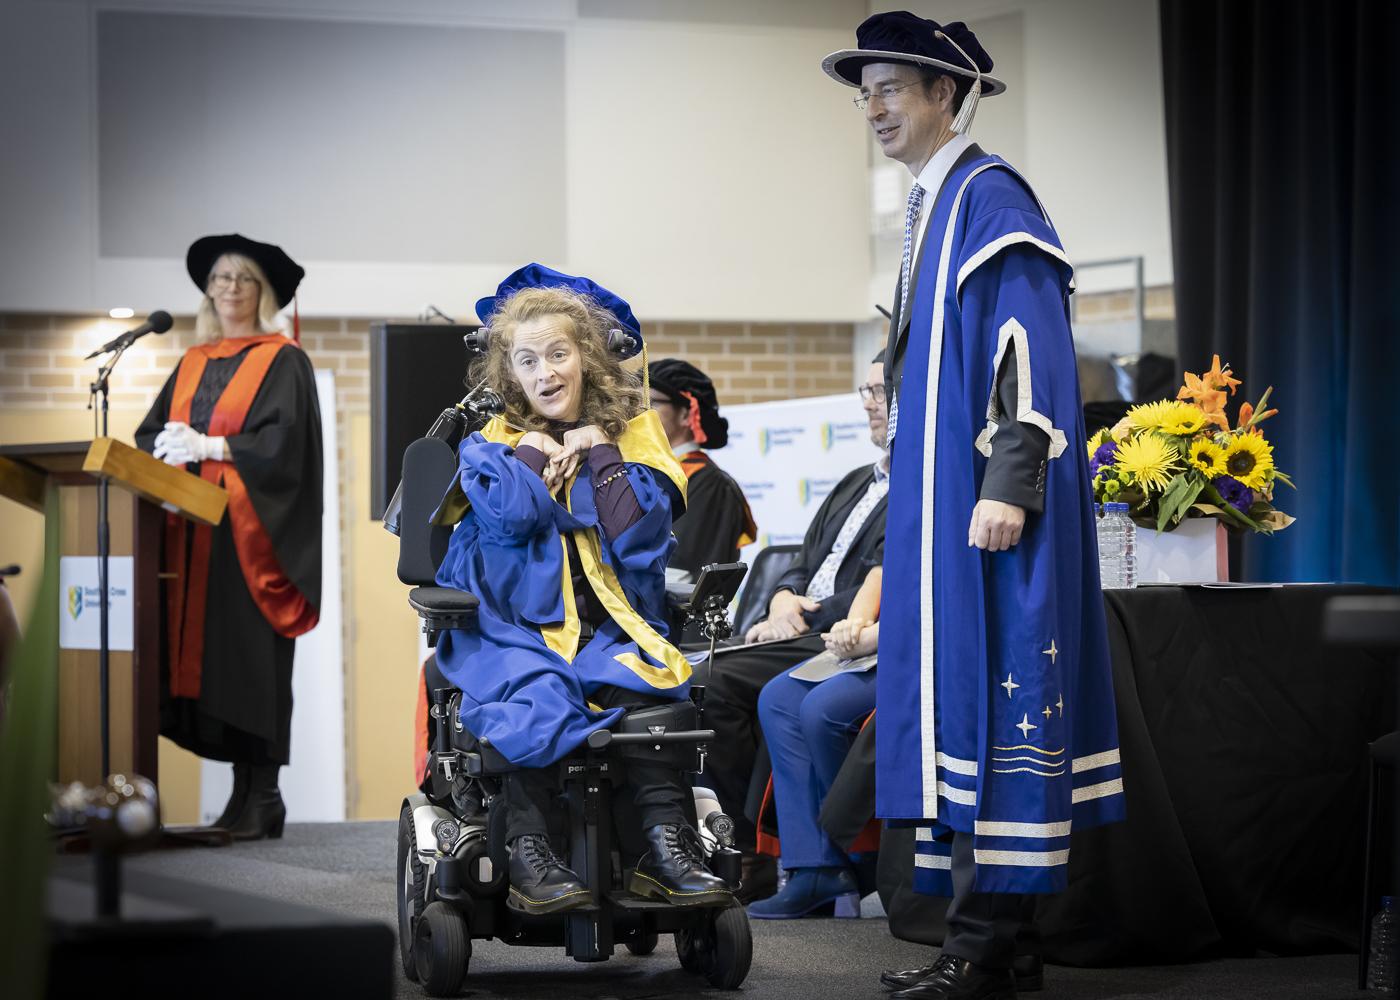 SCU Coffs Harbour Campus Graduation Ceremony 26 June 2021